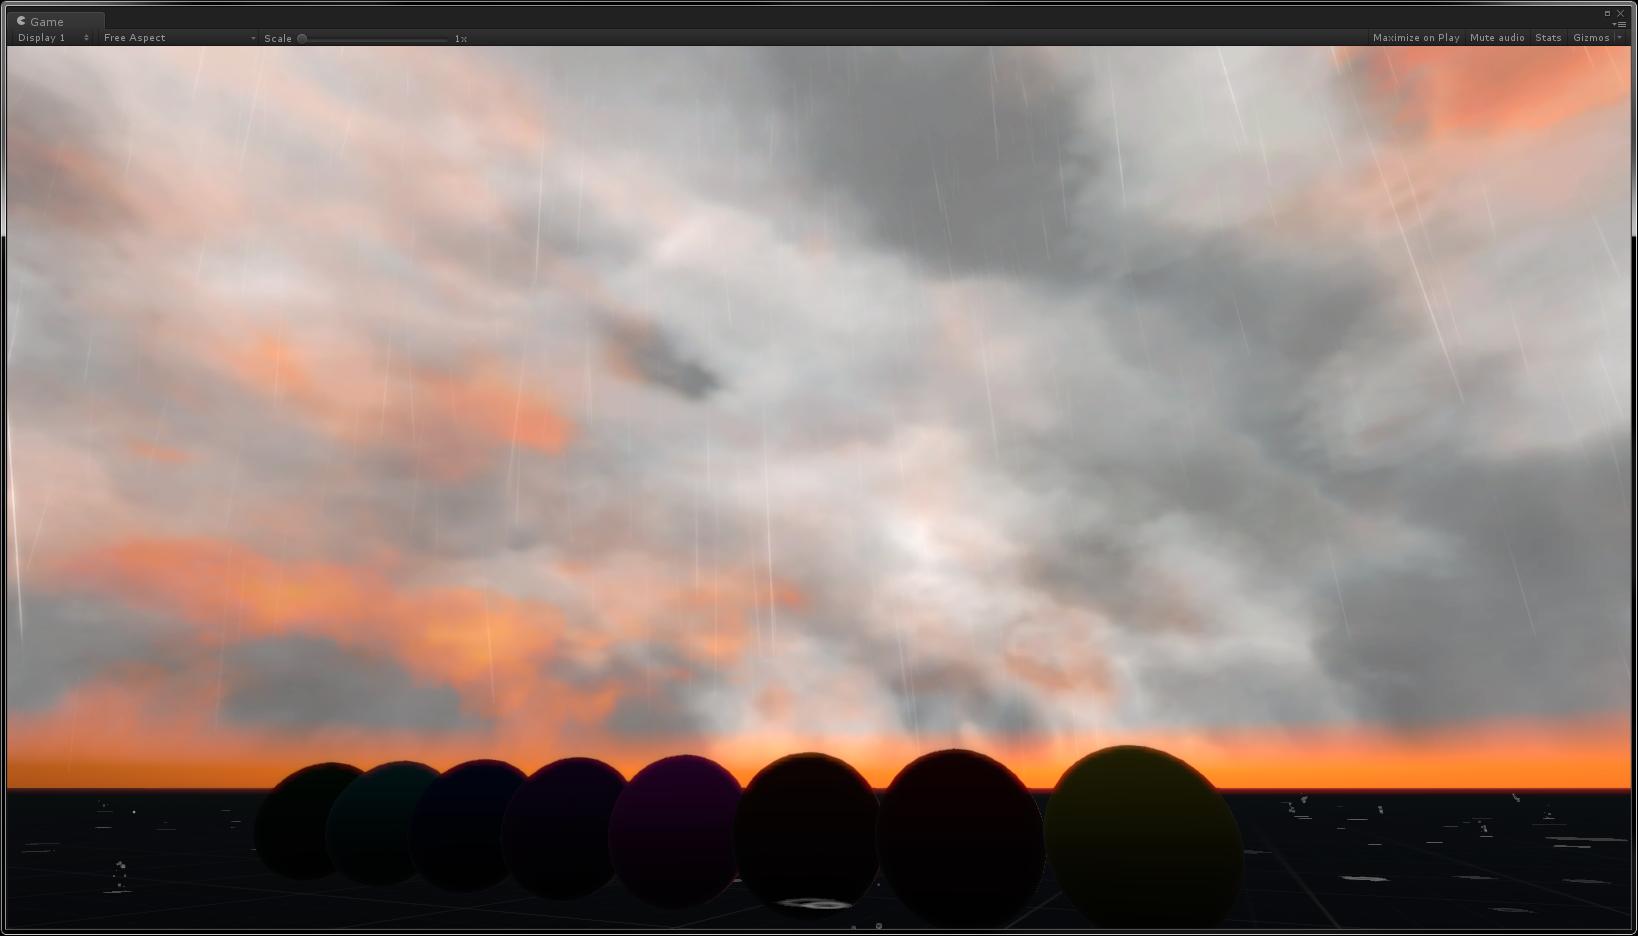 Genesis Weather Raining 0600.png